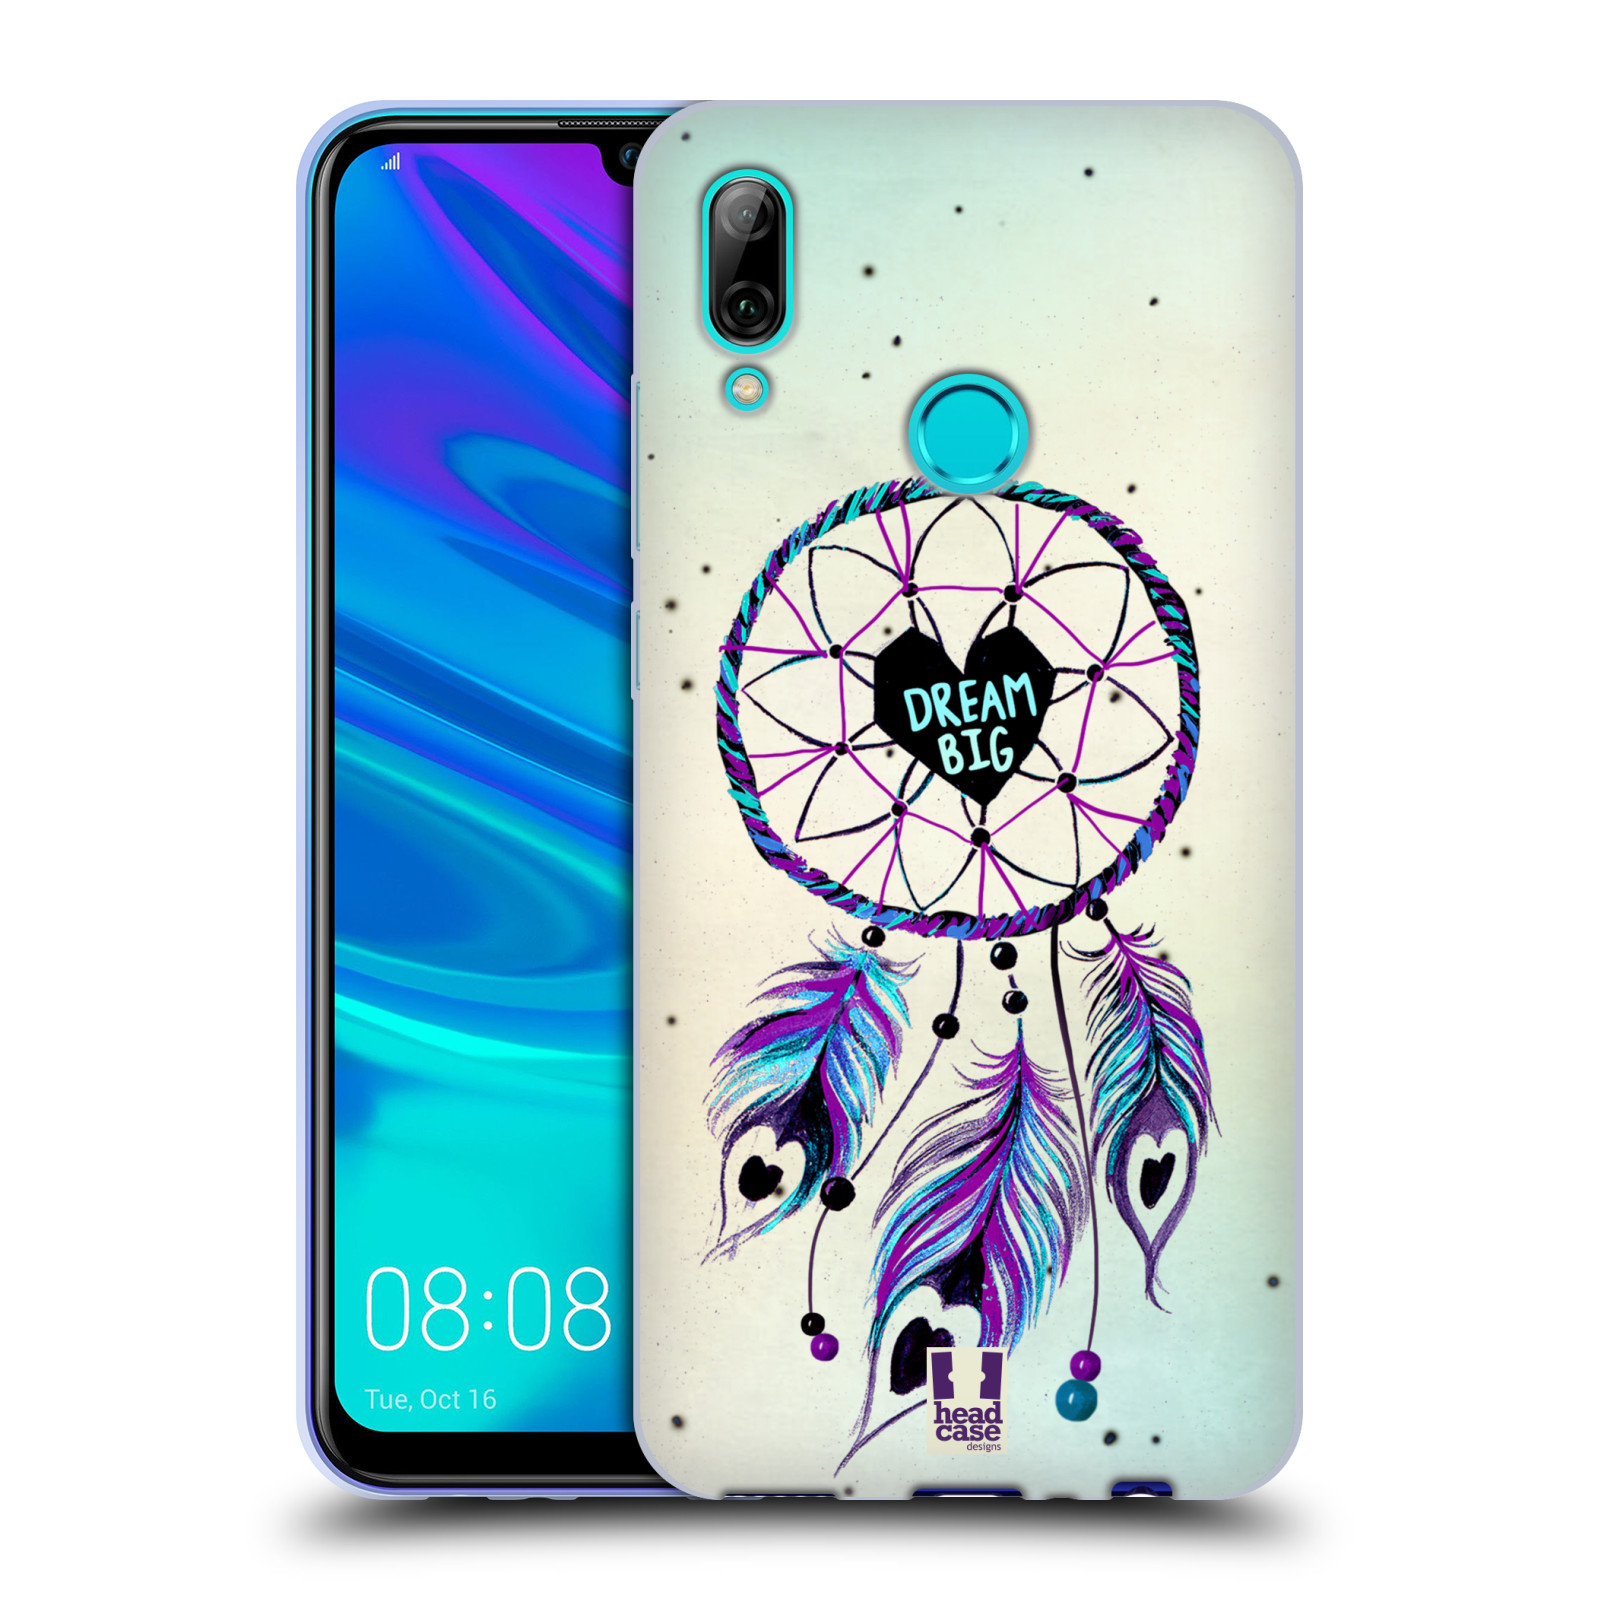 Silikonové pouzdro na mobil Huawei P Smart (2019) - Head Case - Lapač Assorted Dream Big Srdce